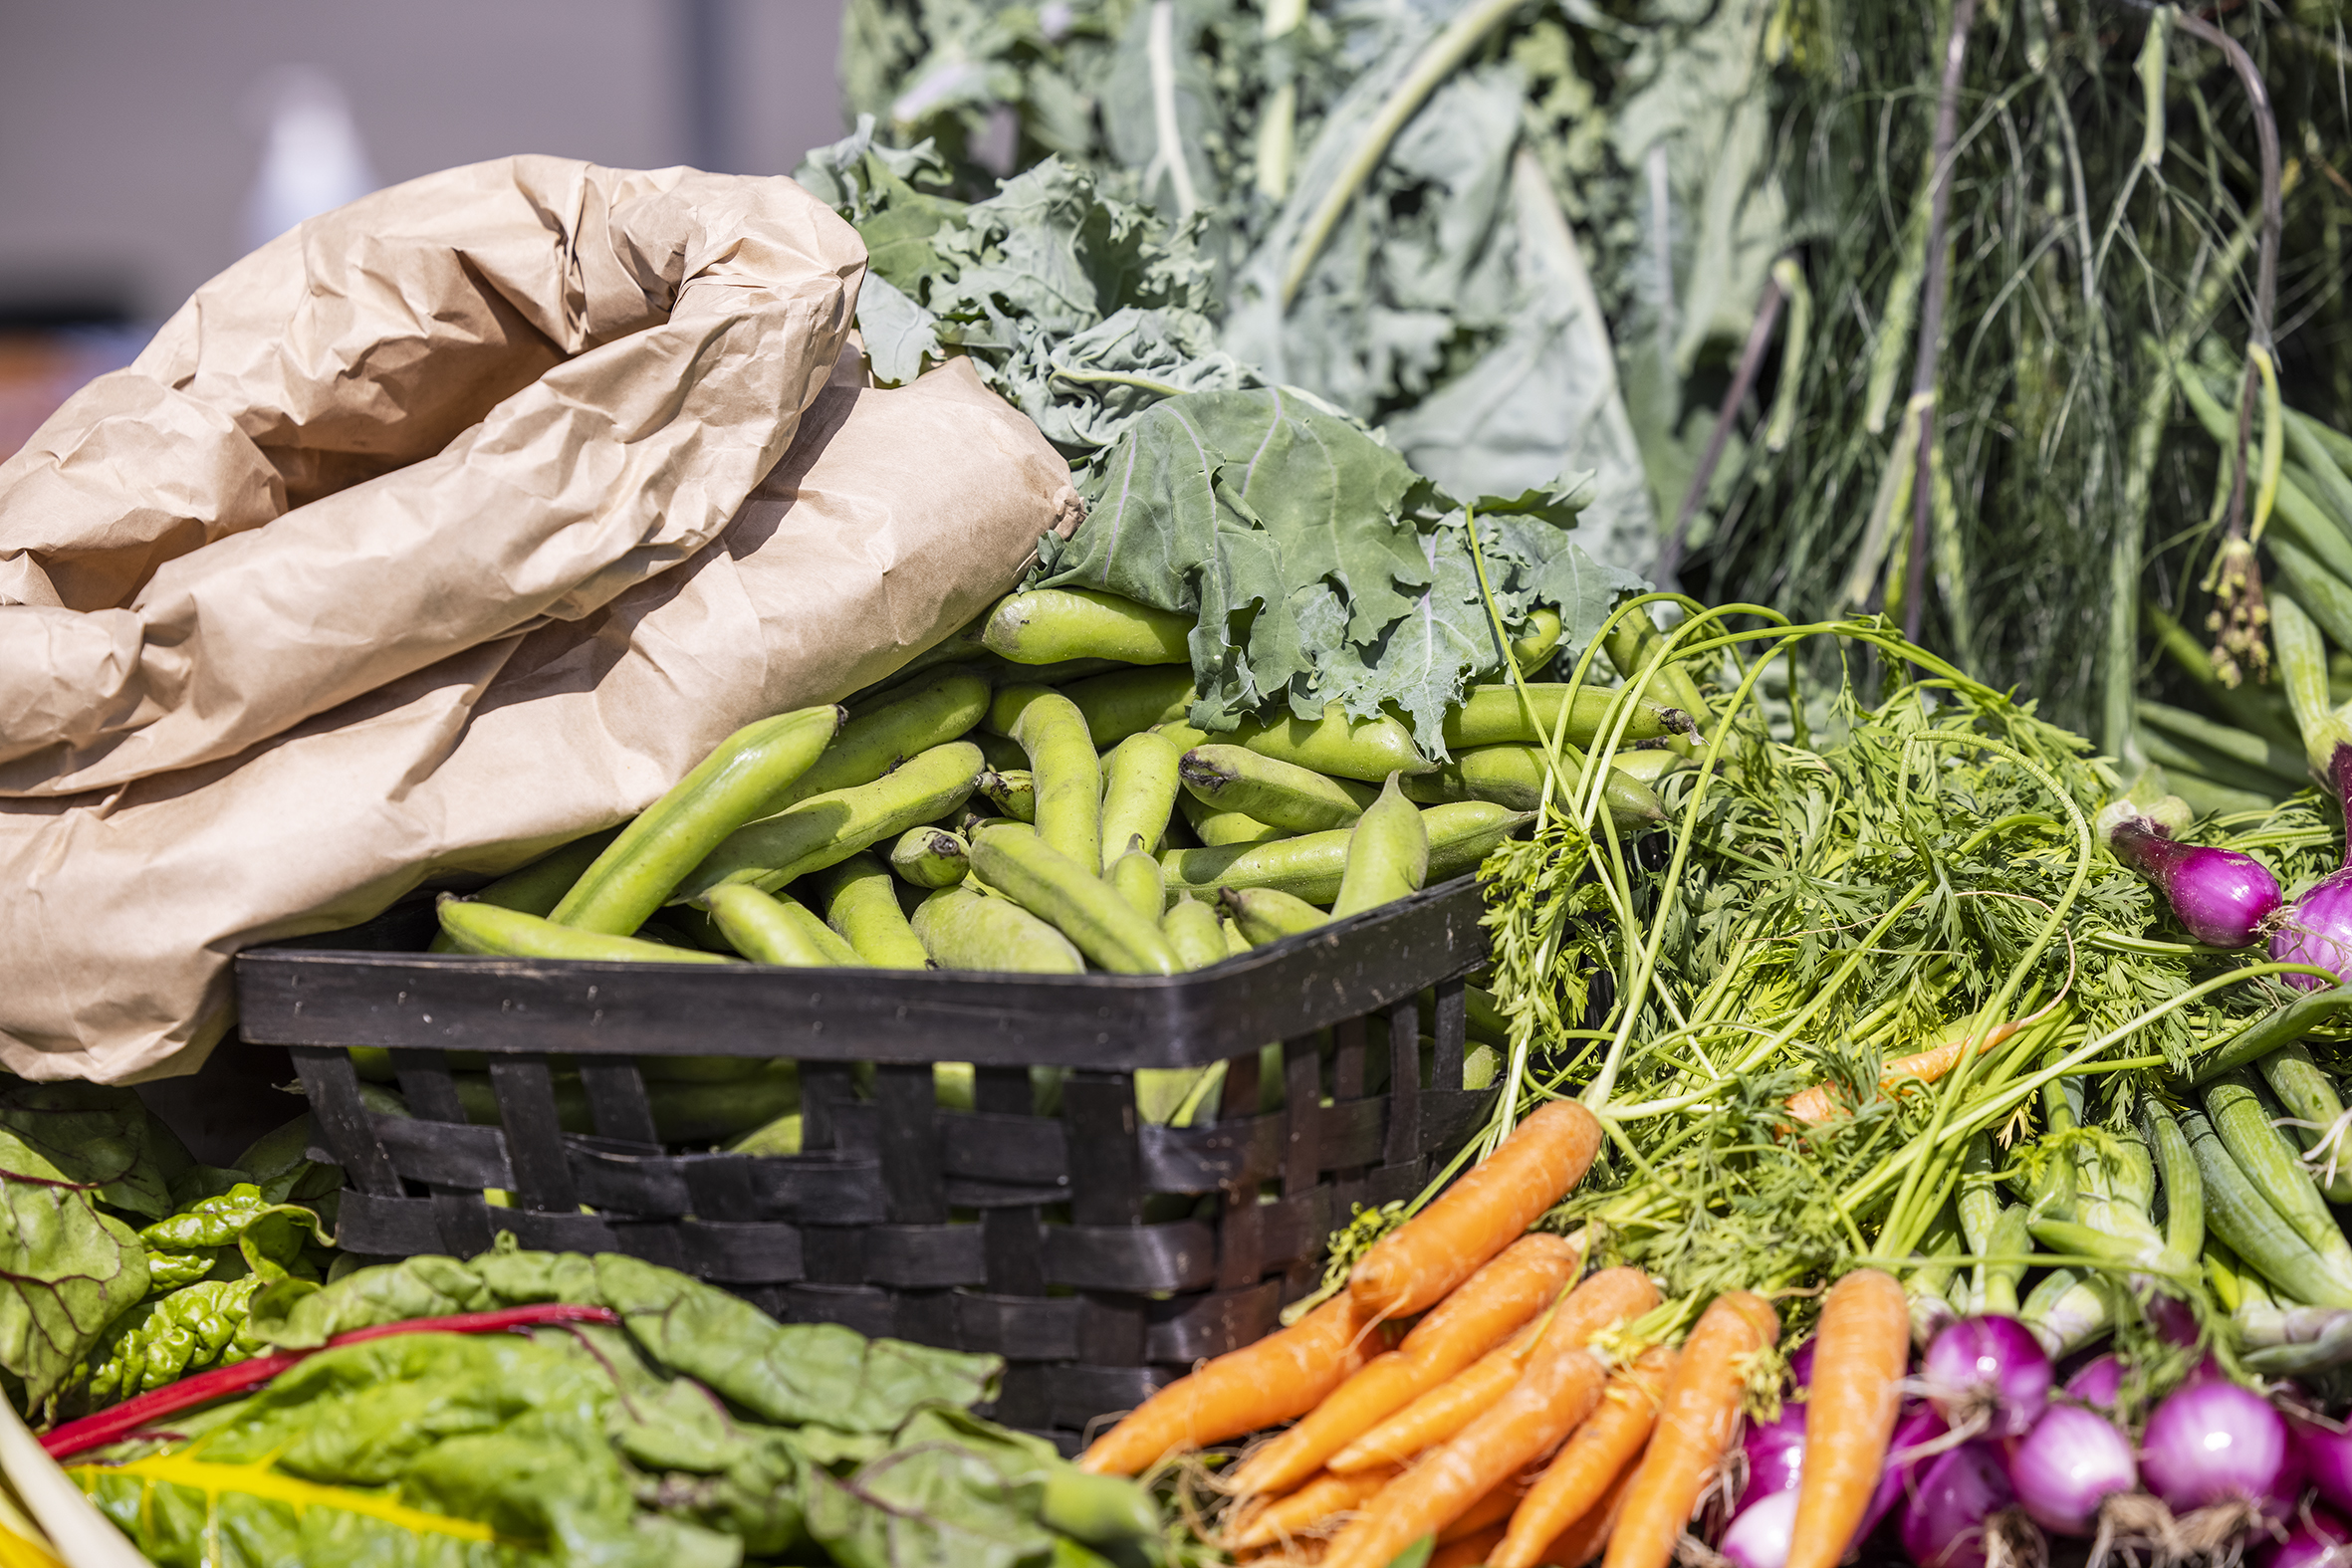 Det rullende Sommerkøkken: Lav gratis mad med lokale kokke